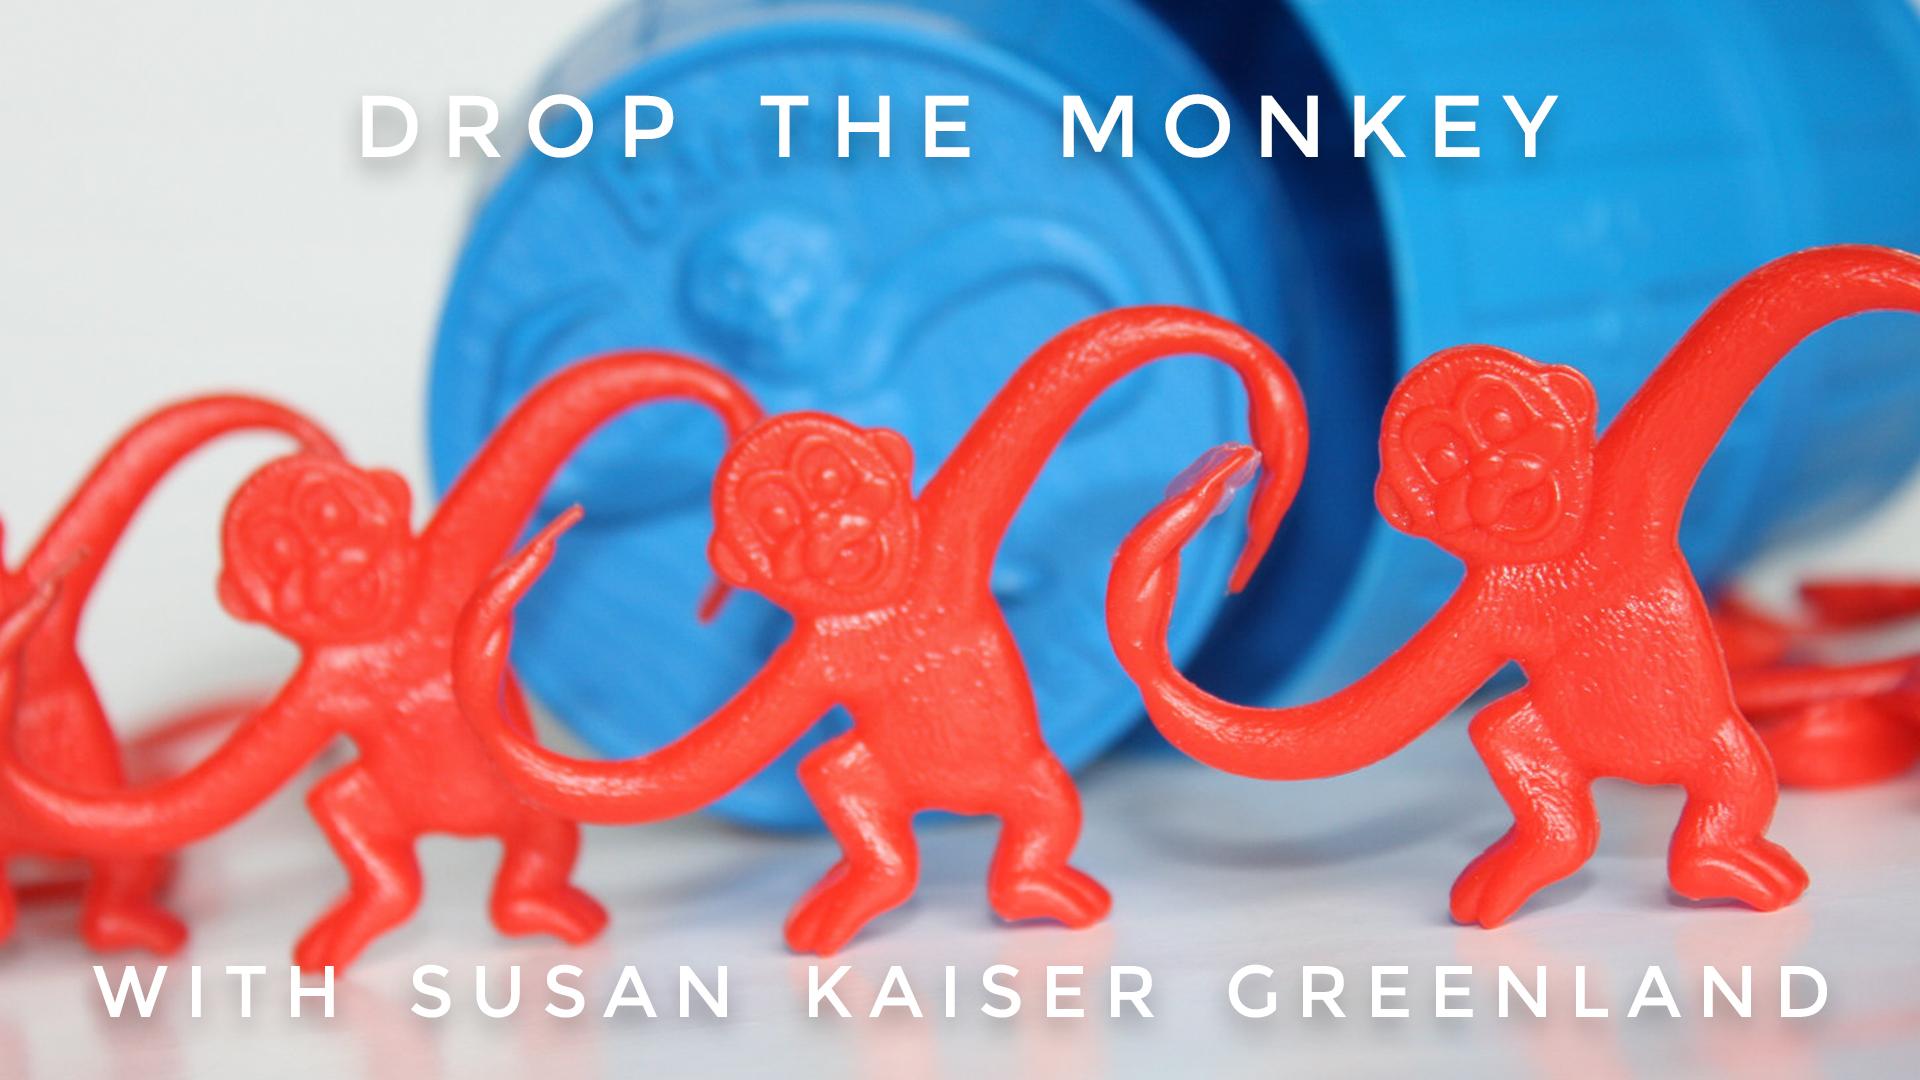 Unplug-Meditation-VHX-Covers-Artwork_Greenland_Drop-The-Monkey.jpg